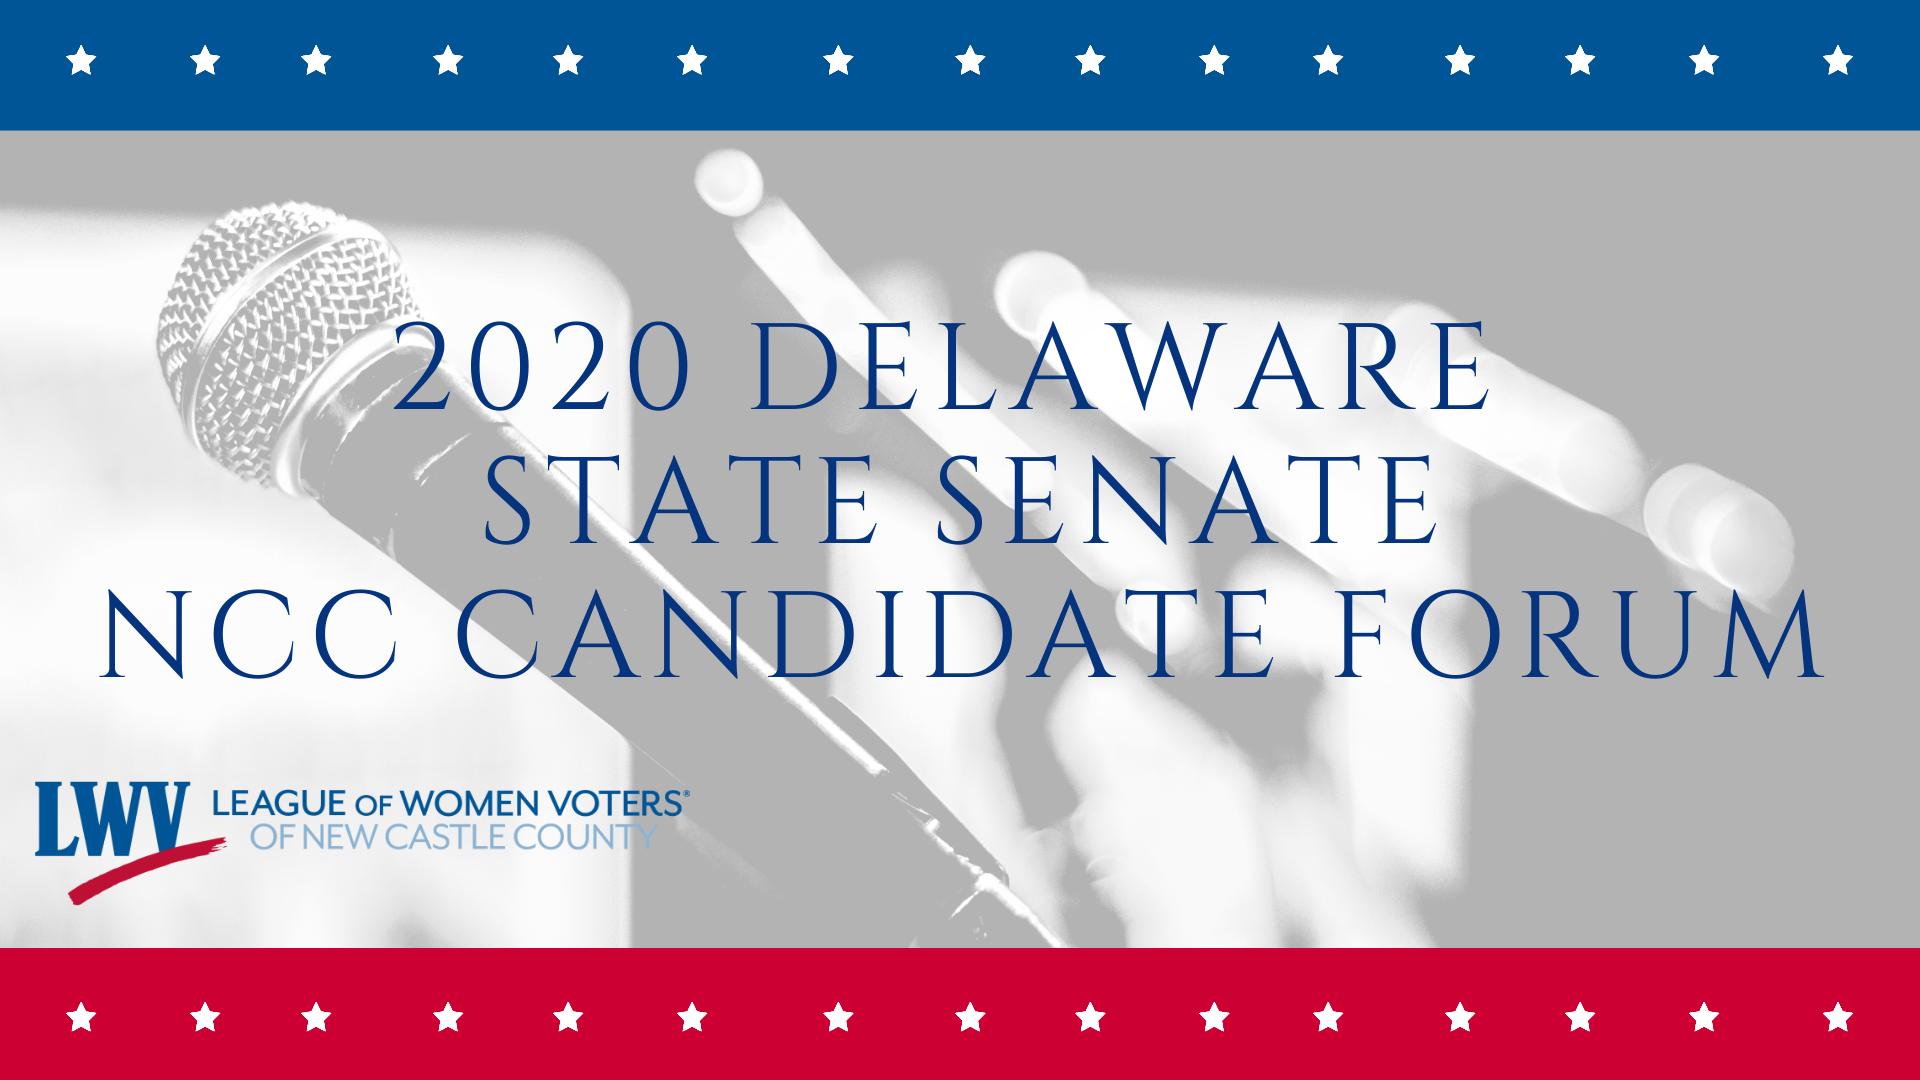 2020 Delaware State Senate NCC Candidate Forum